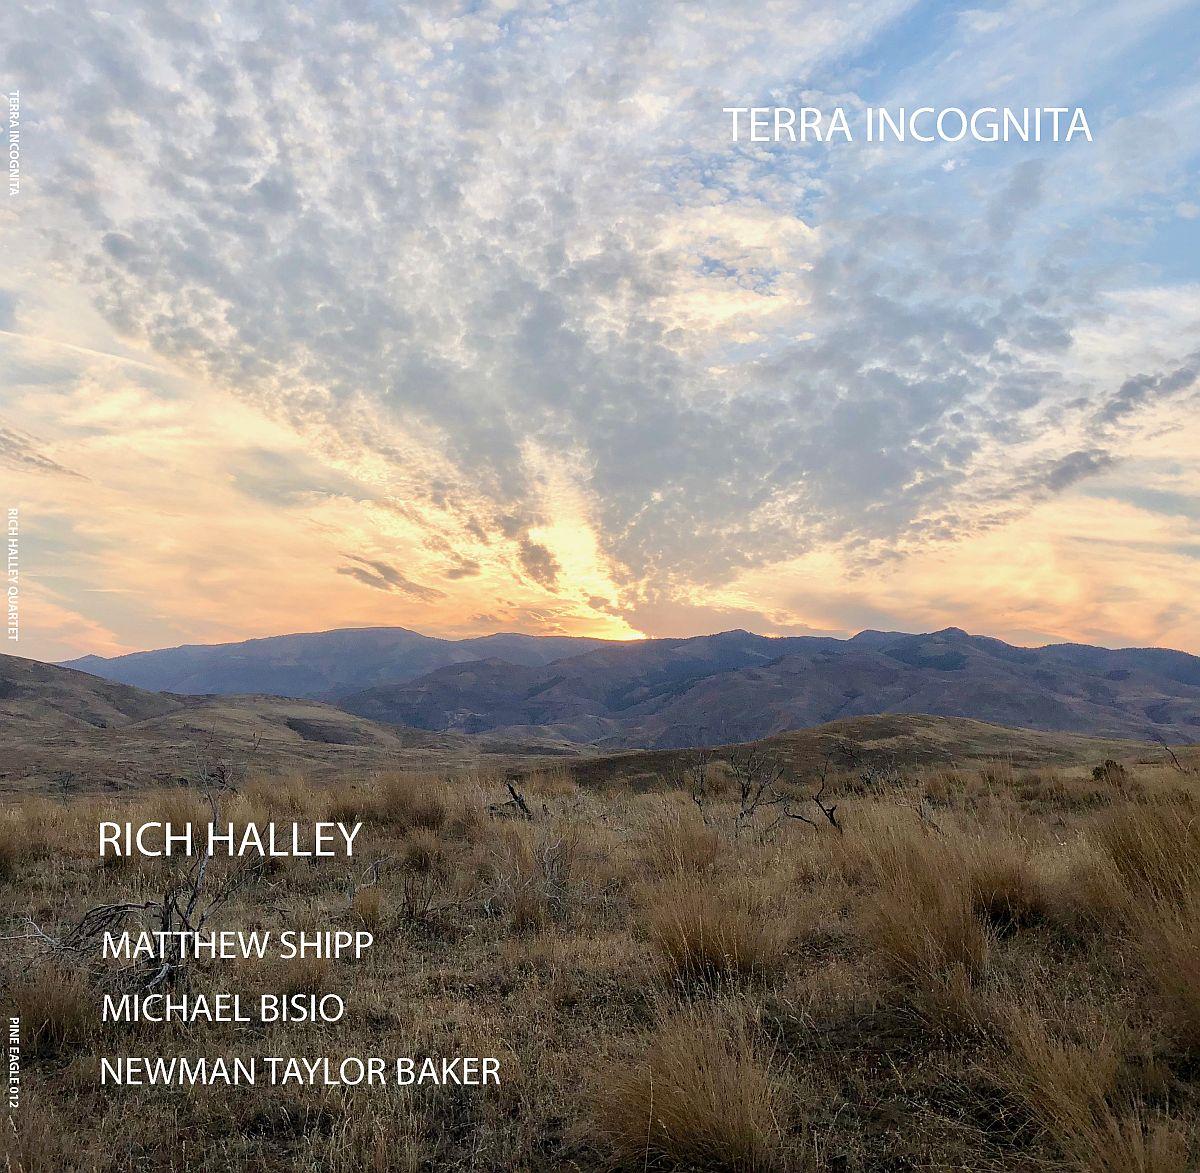 Halley Terra Incognita Cover1200pix